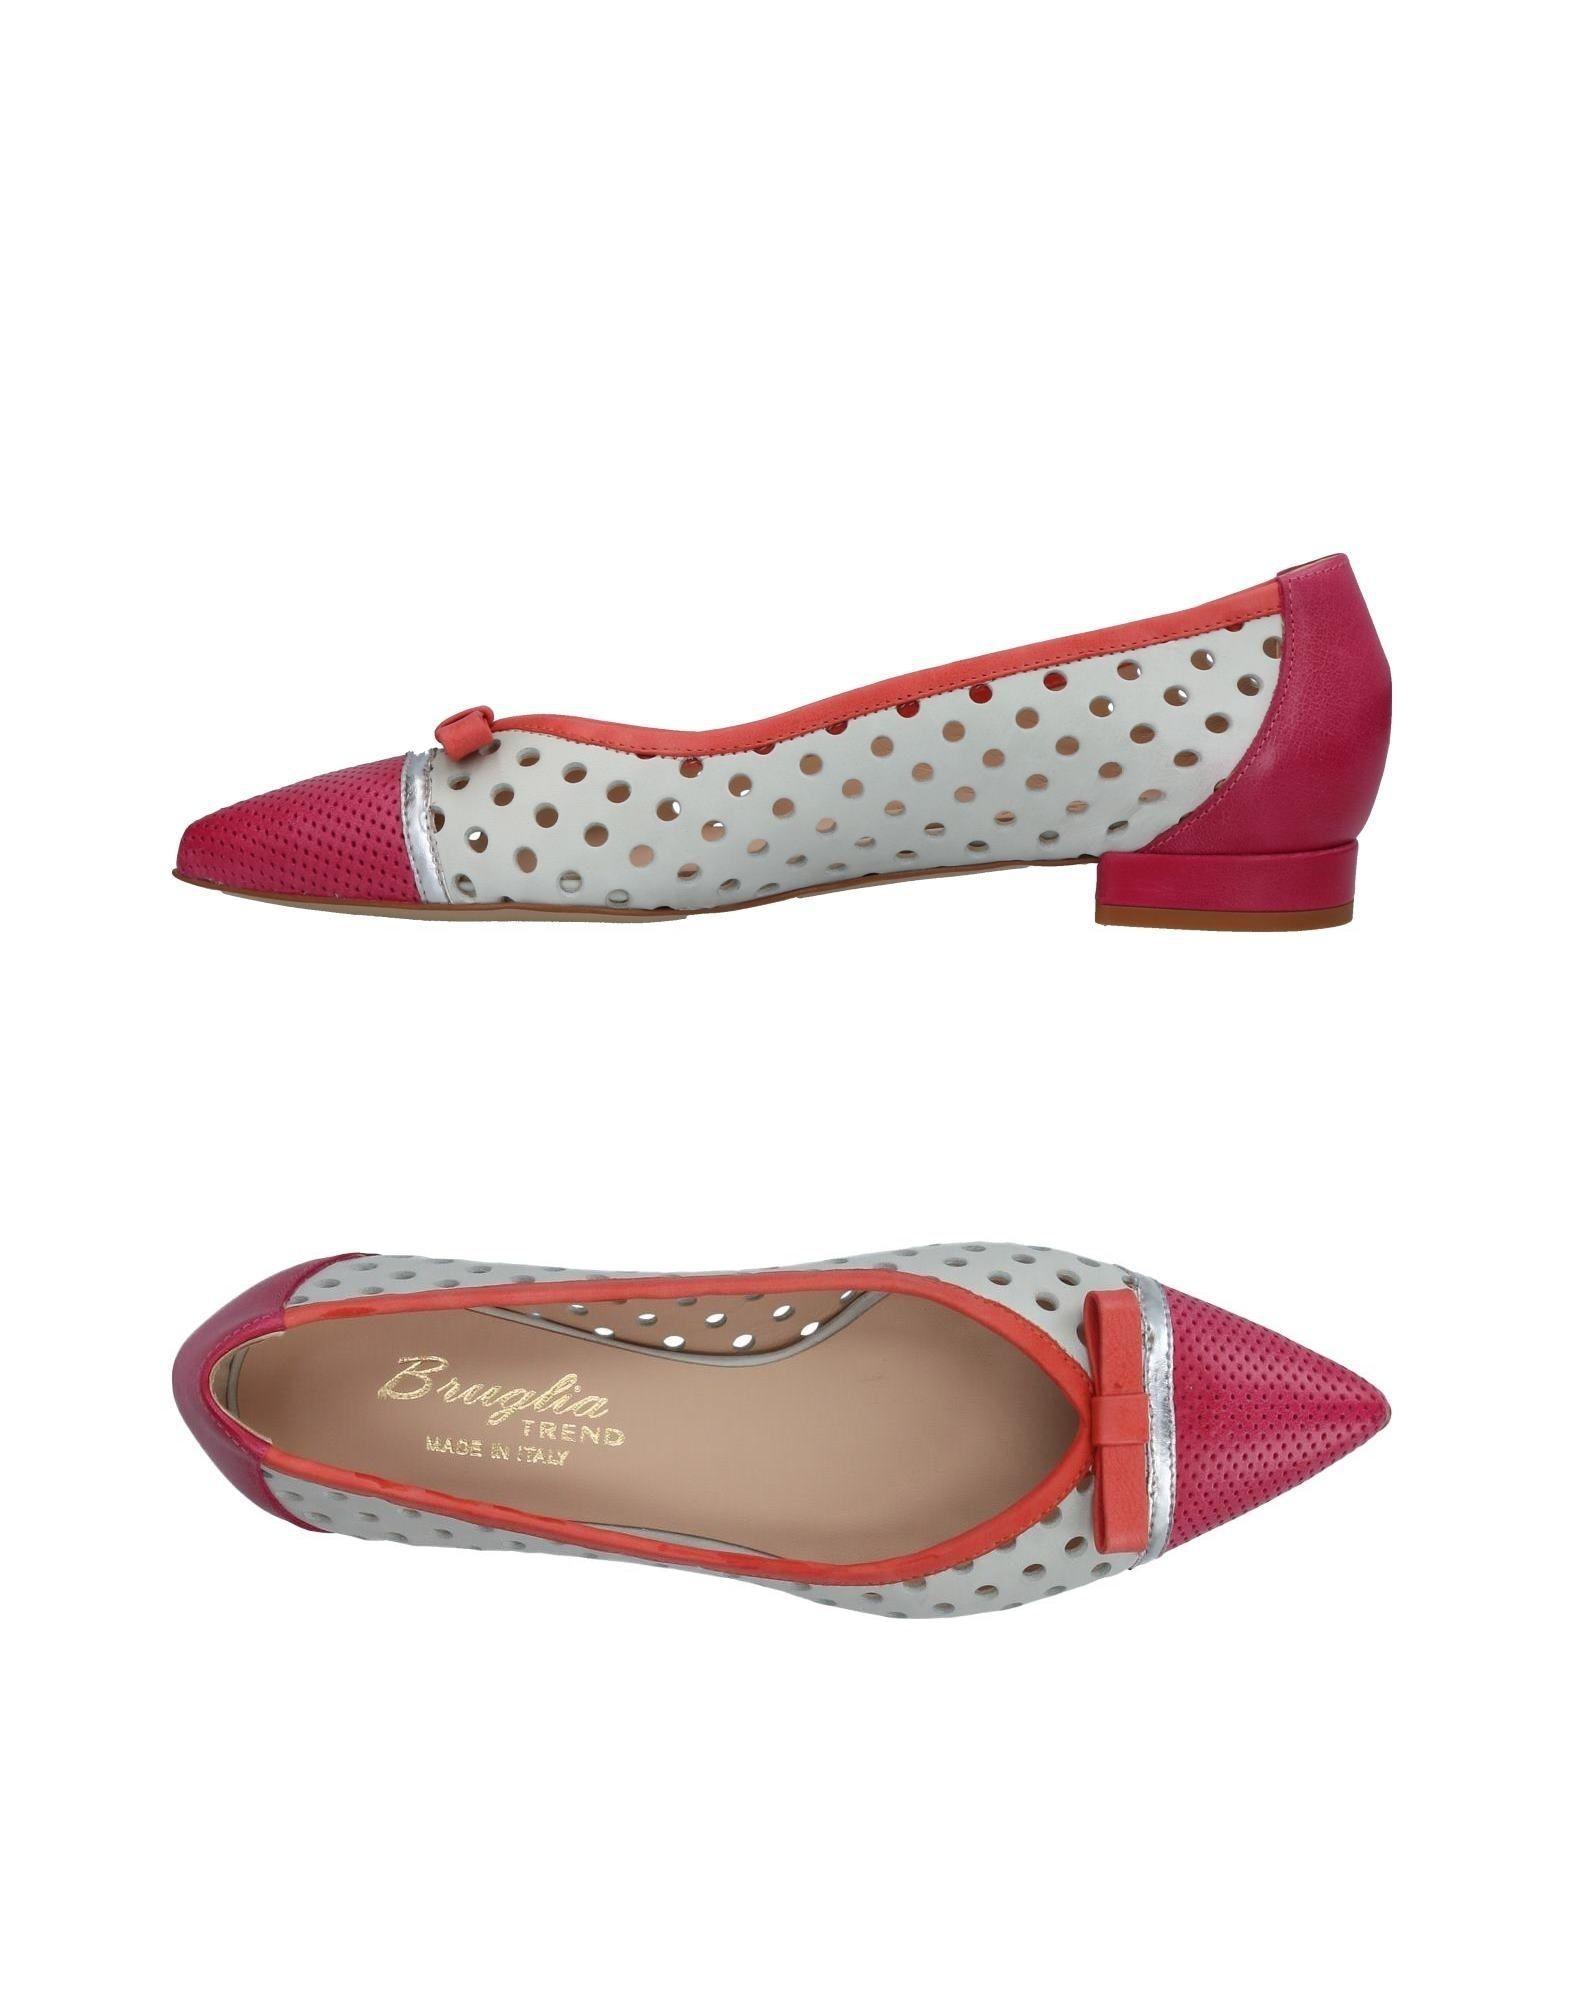 F.Lli Bruglia Ballerinas Damen  11408631TJ Gute Qualität beliebte Schuhe